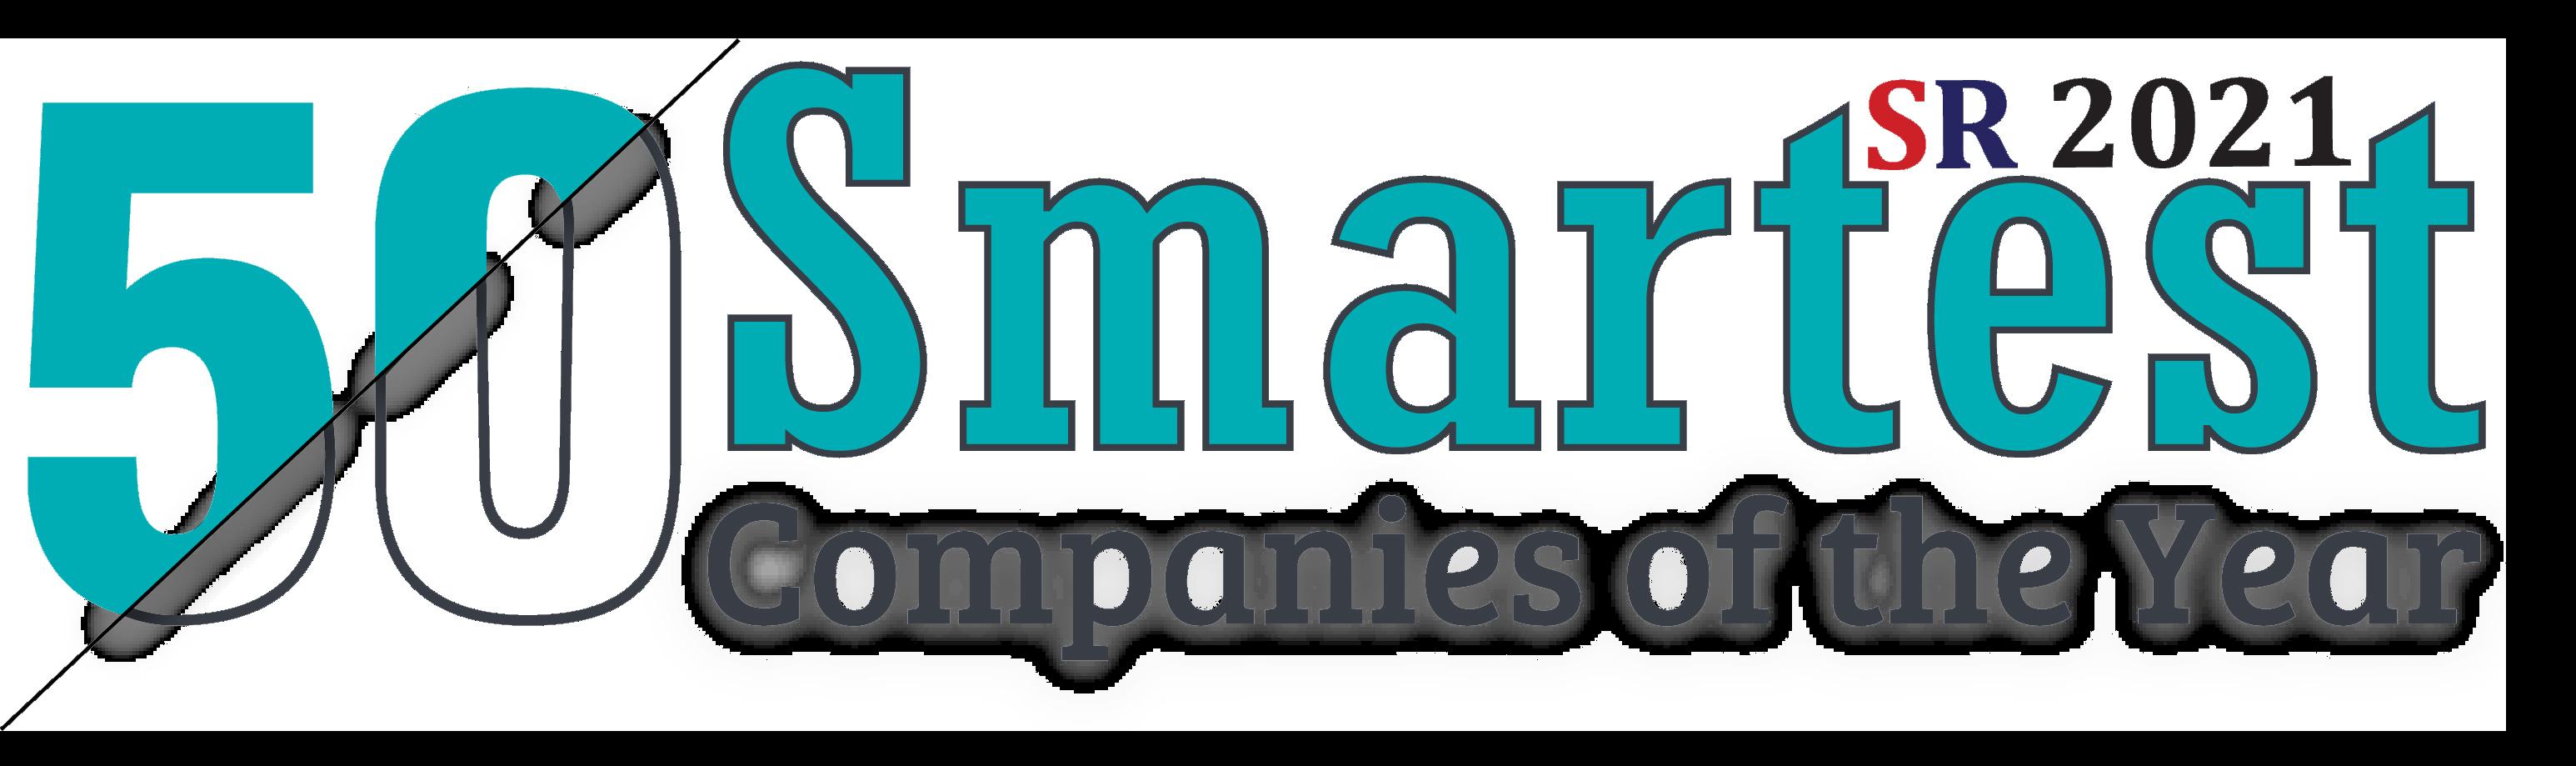 50 Smartest Companies Badge